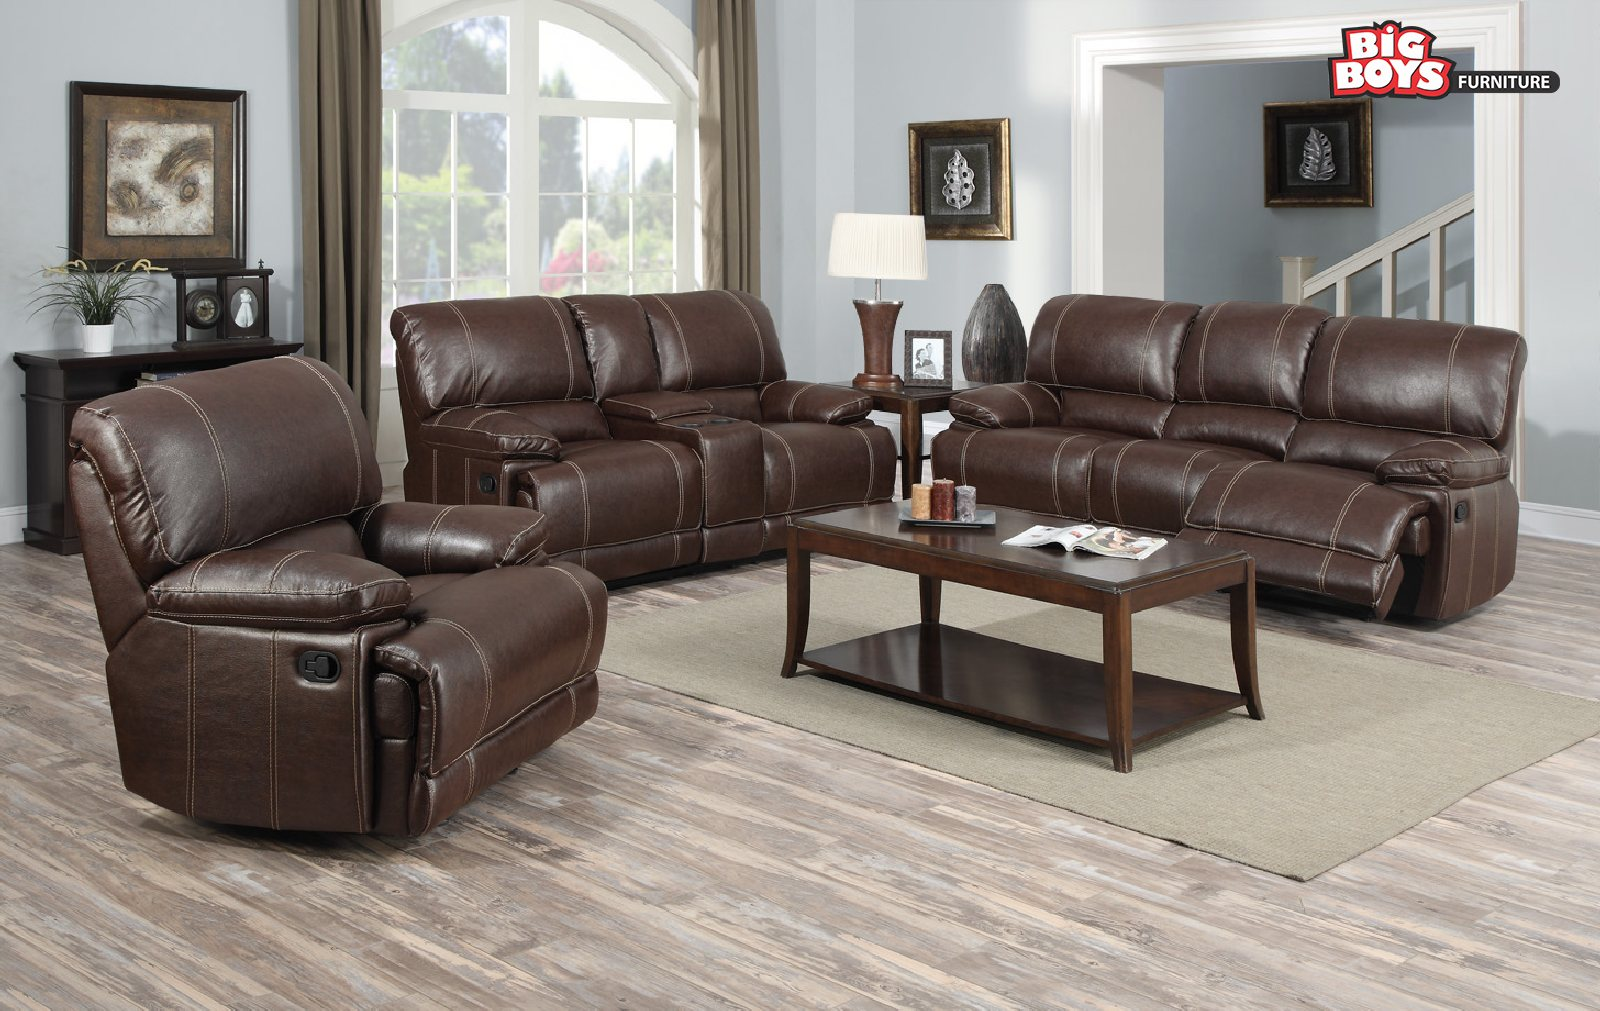 Big Boys Furniture offers discounts on Sofa Sets